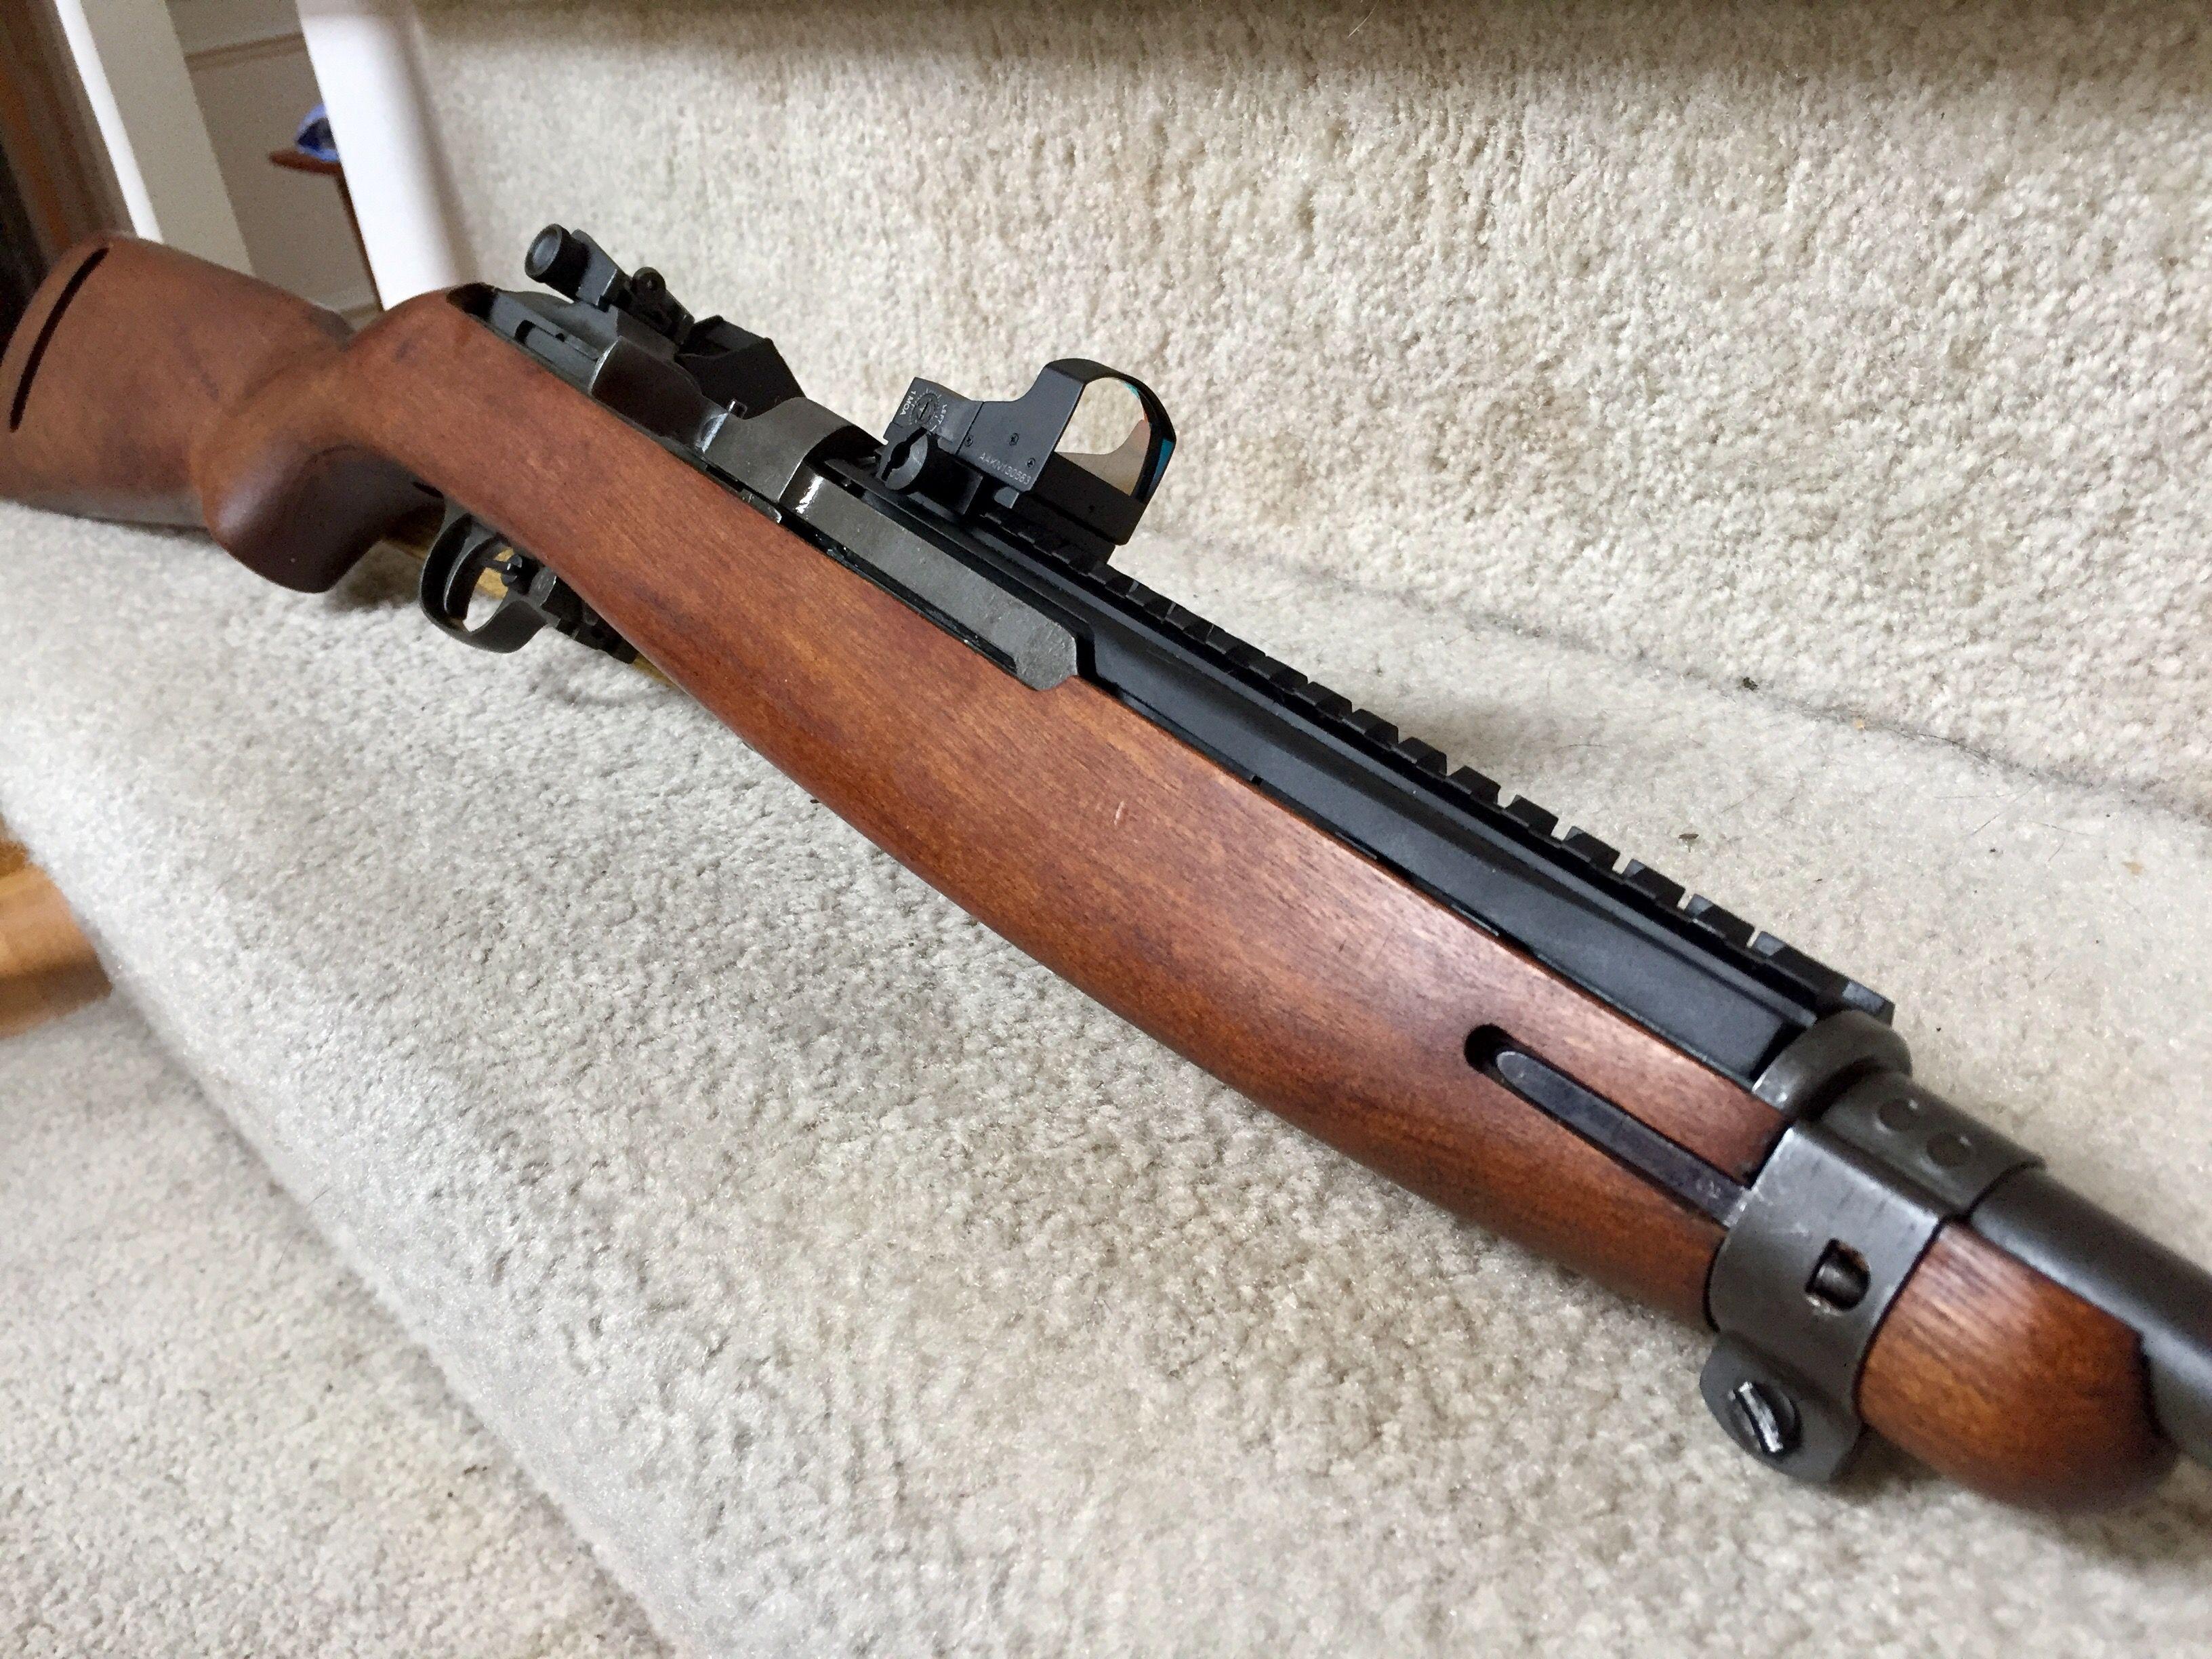 M1 Carbine Custom rail to replace original heat shield to